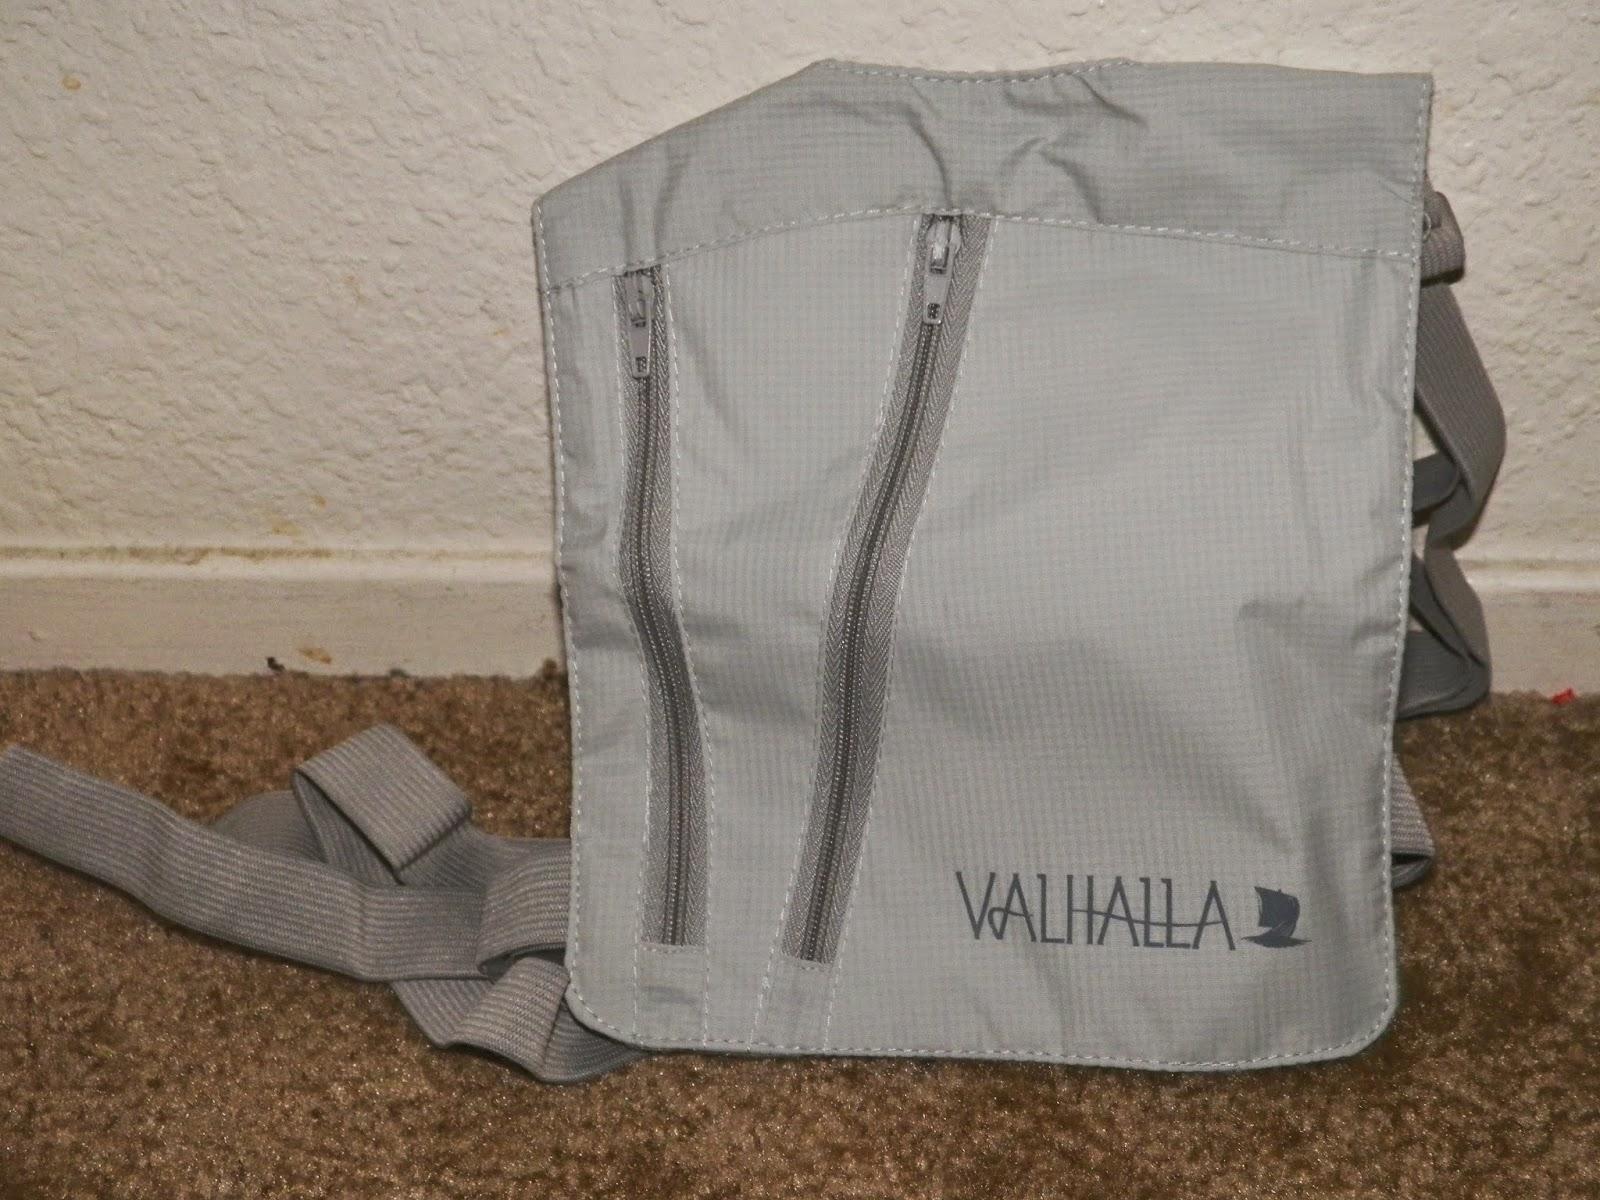 Valhalla_Skinsafe_Undercover_Wallet.jpg